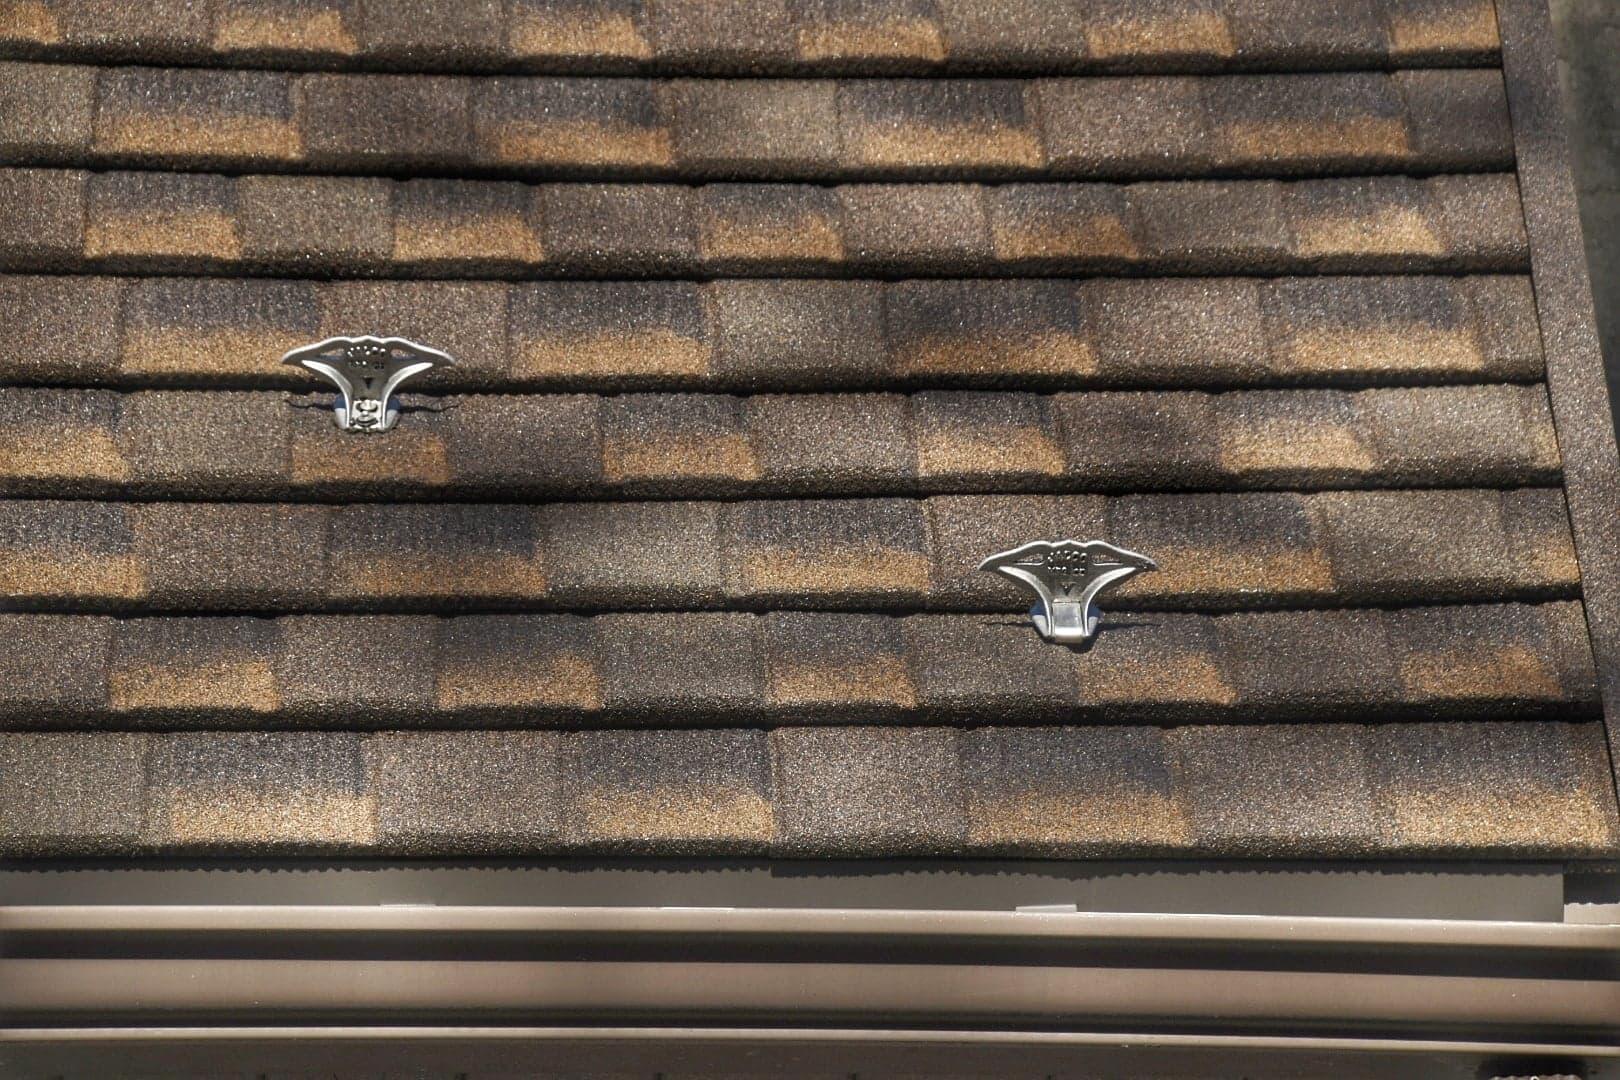 jalco snowguards brown-beige-shingle roof snowguards - closeup - 84269764